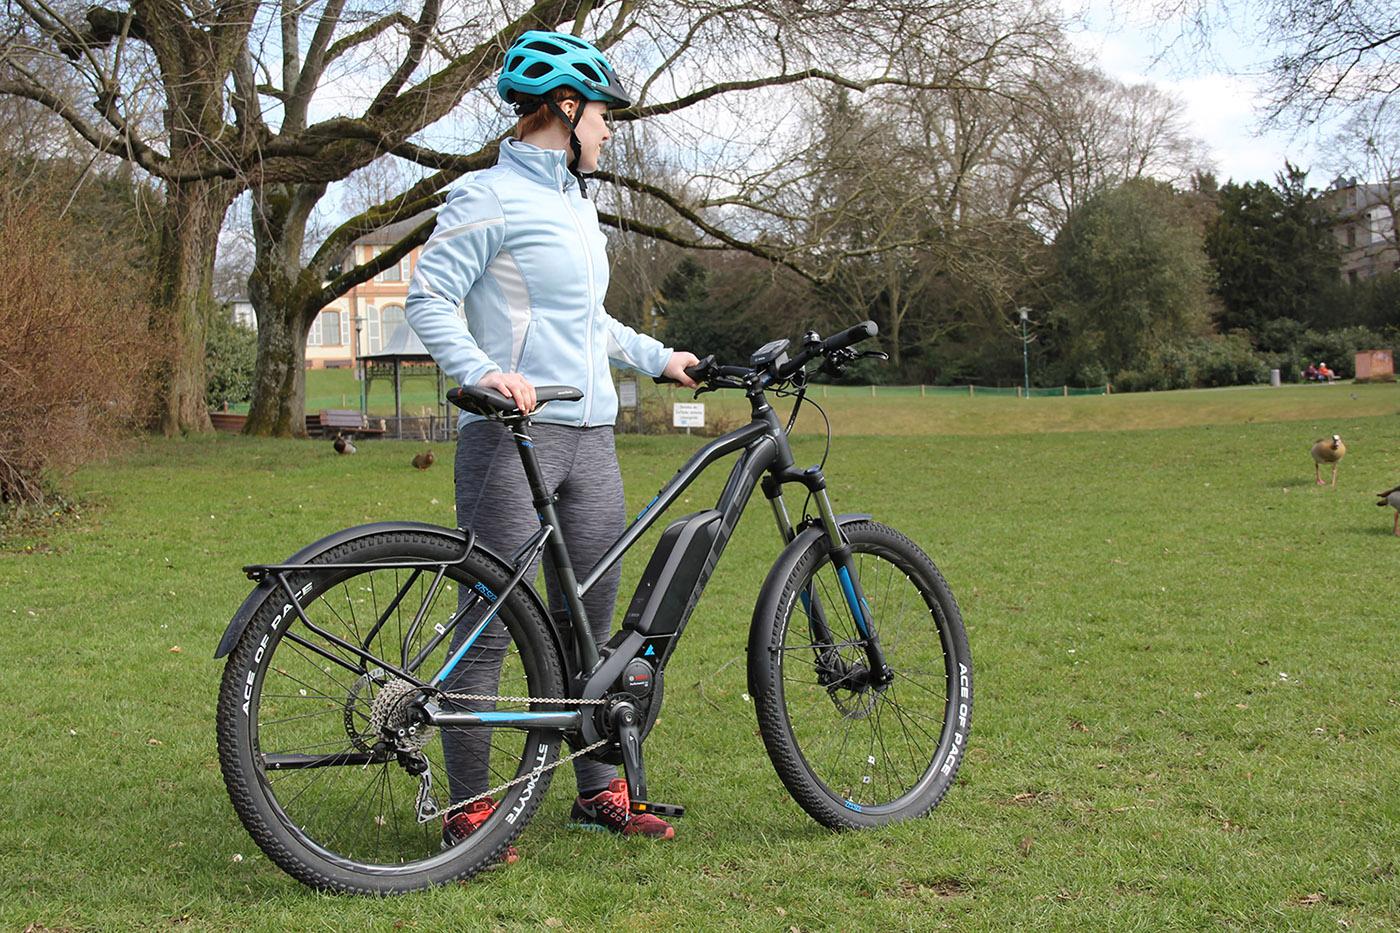 lipoedem mode ebike e-bikes sport mit lipödem lymphödem lymphoedem lipoedema lymphodema 2